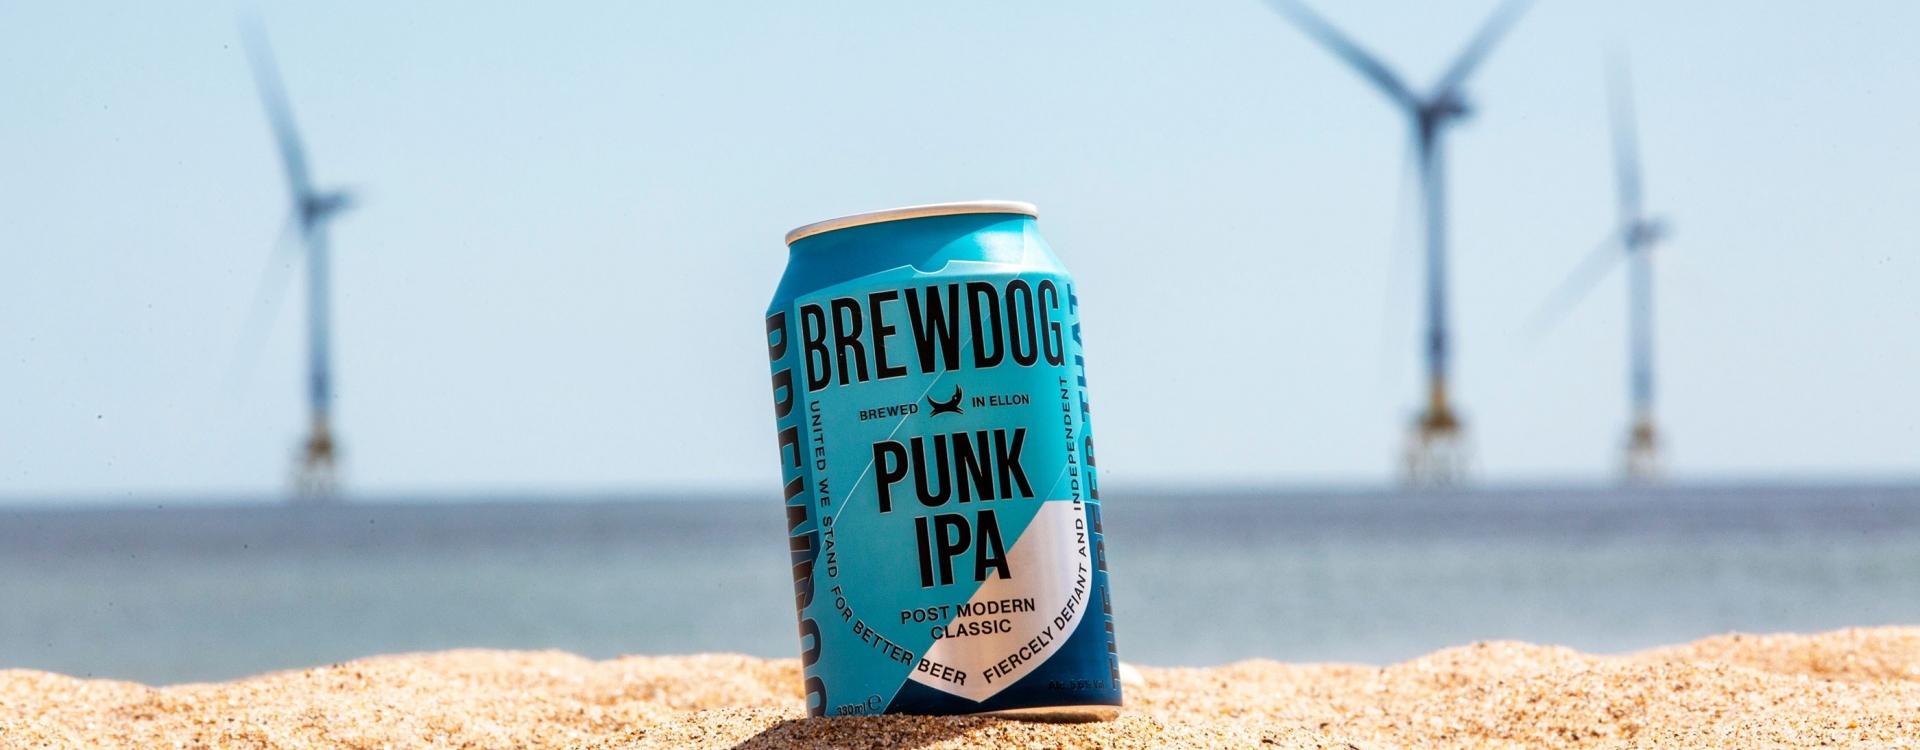 Brands brewdog 01